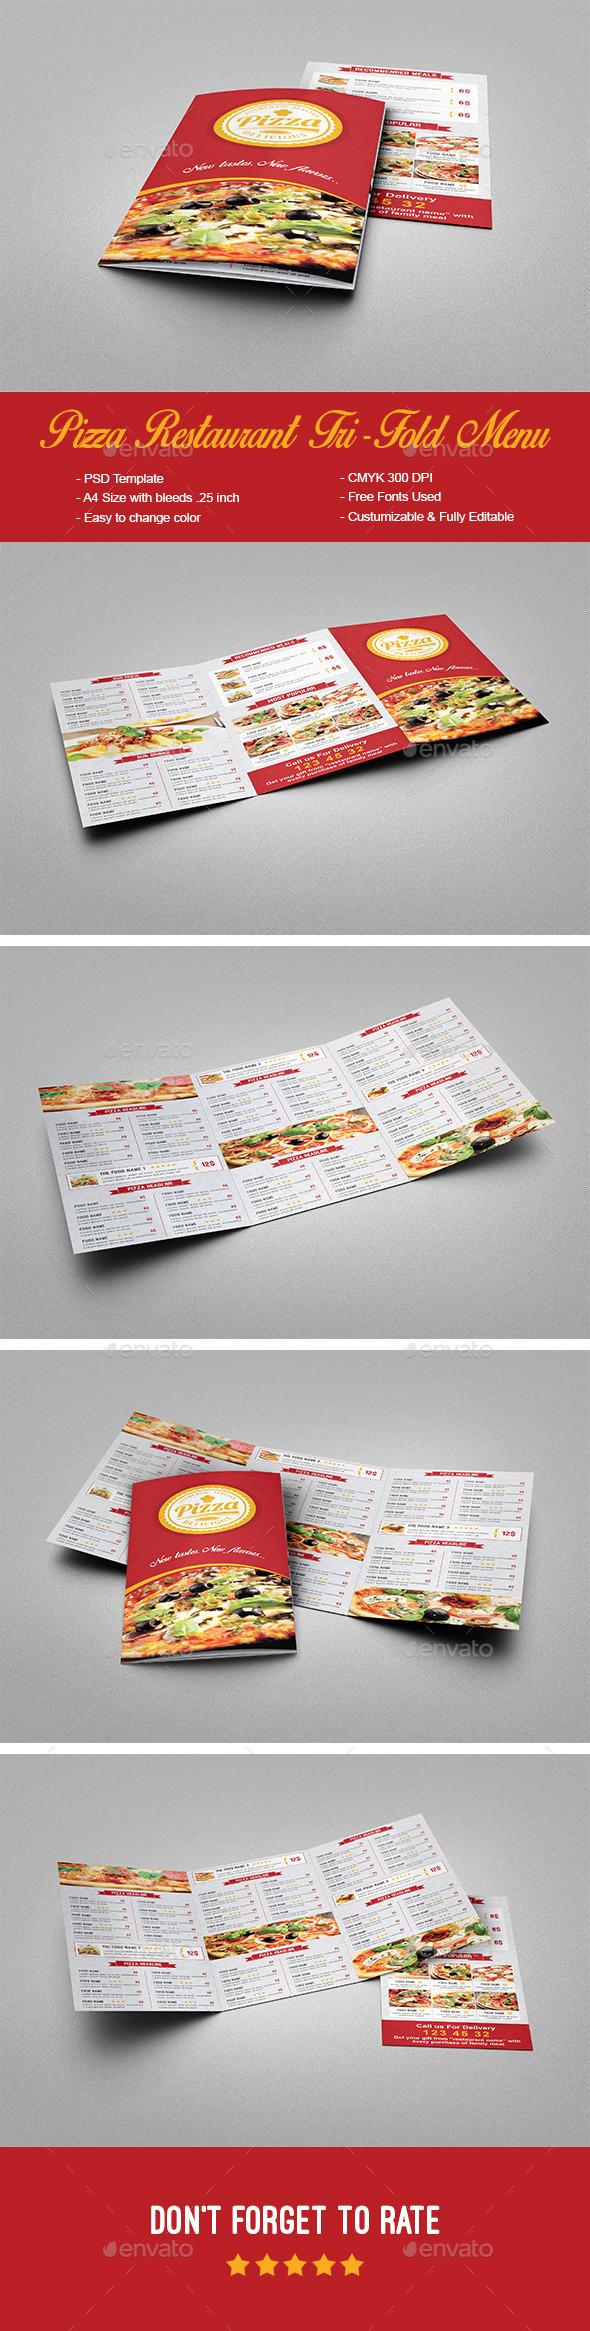 Pizza Restaurant Trifold Menu - Food Menus Print Templates